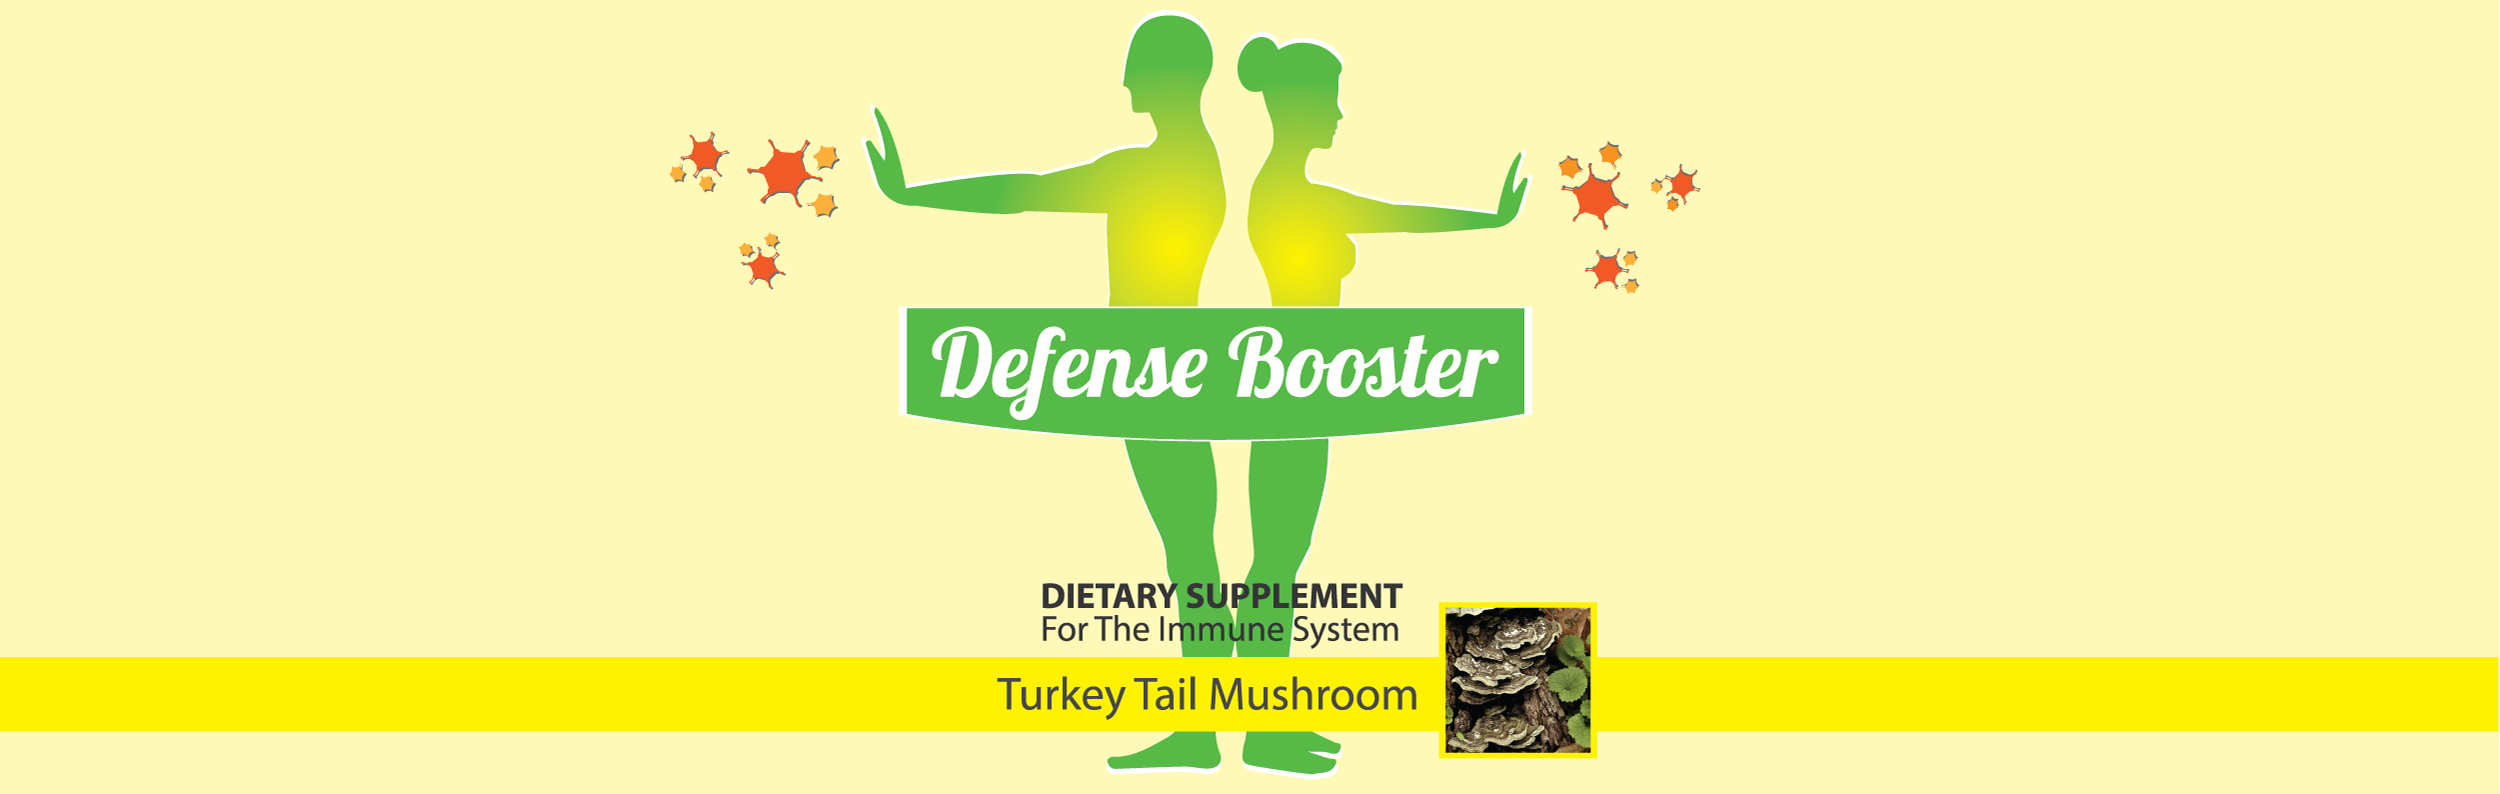 Turkey Tail Defense